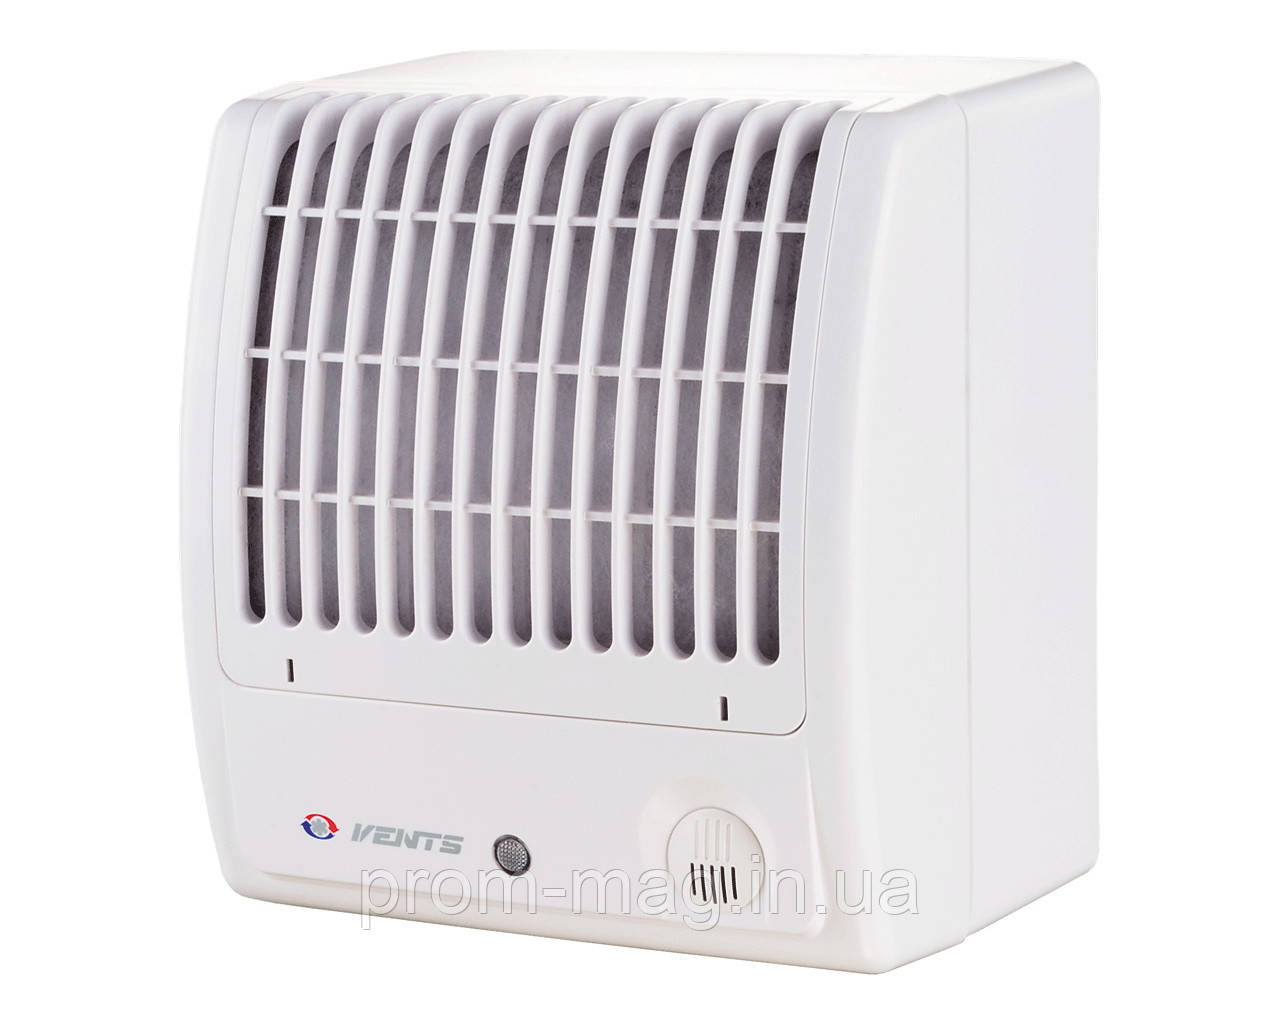 Вентилятор Вентс ЦФ 100 ВТ